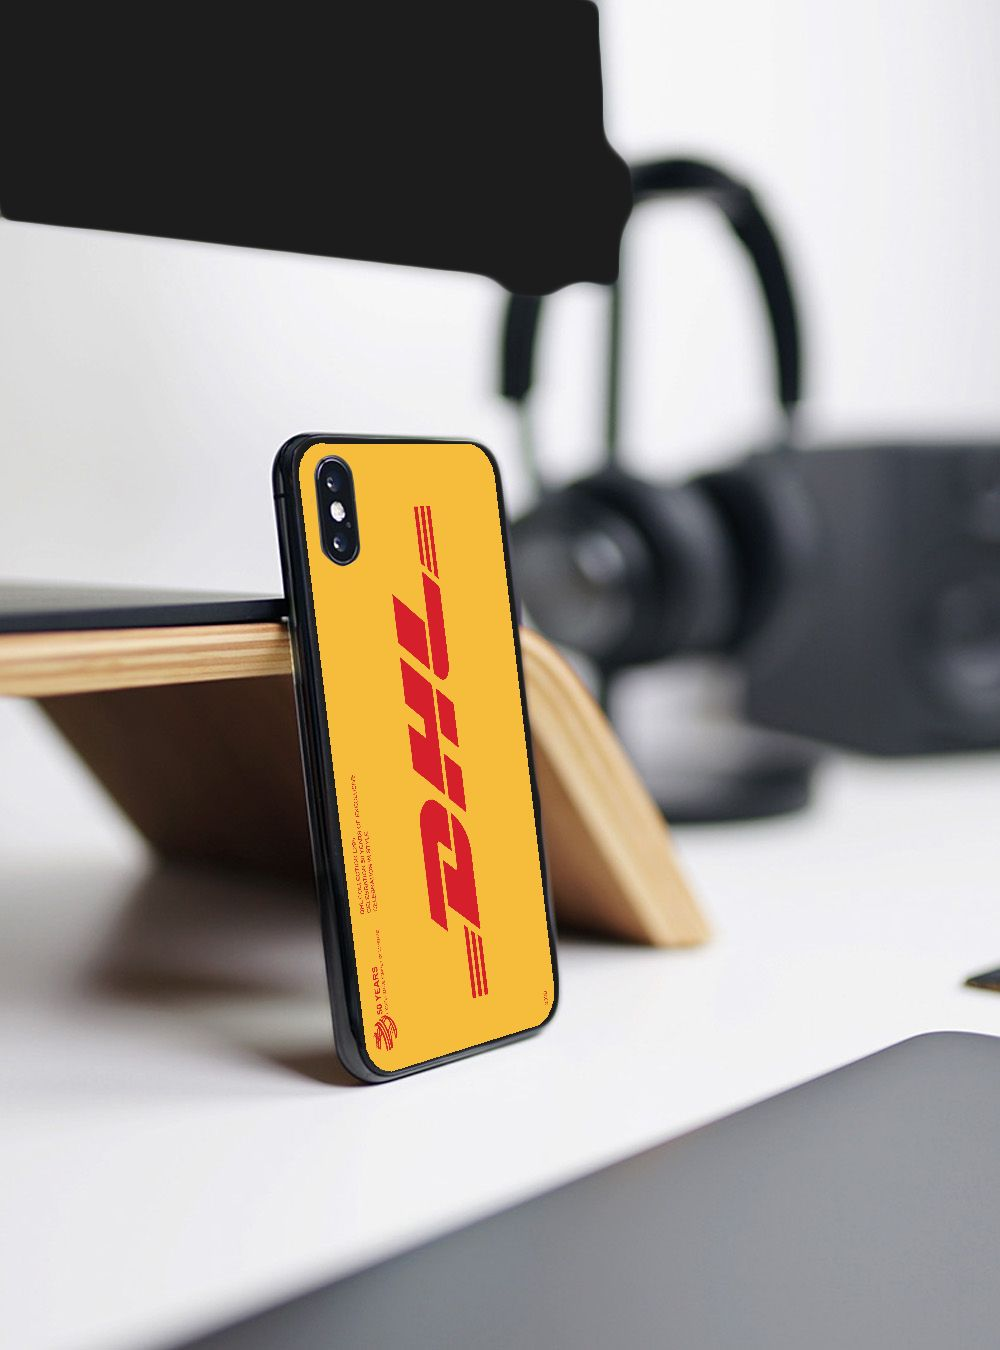 Easybyz DHL Express caso de moda para iPhone 11 Pro XR X Xs X Max 8 7 6 Plus 6S 5S SE esmerilado casos de silicona suave carcasa de la contraportada